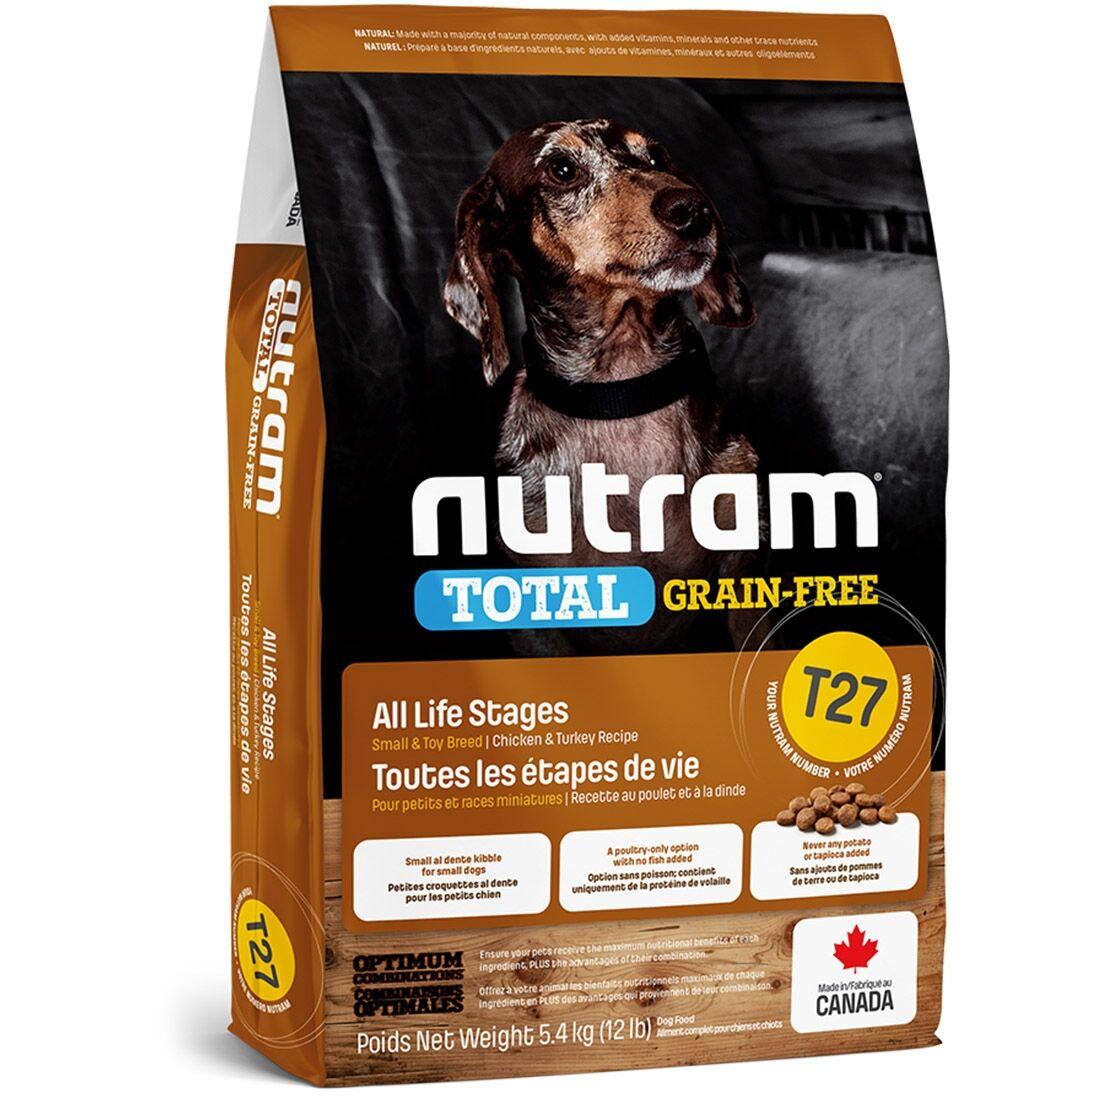 Nutram Croquettes chien Nutram Total Grain-Free T27 Small et Toy Breed Turkey, Chicken & Duck Contenance : 2 kg